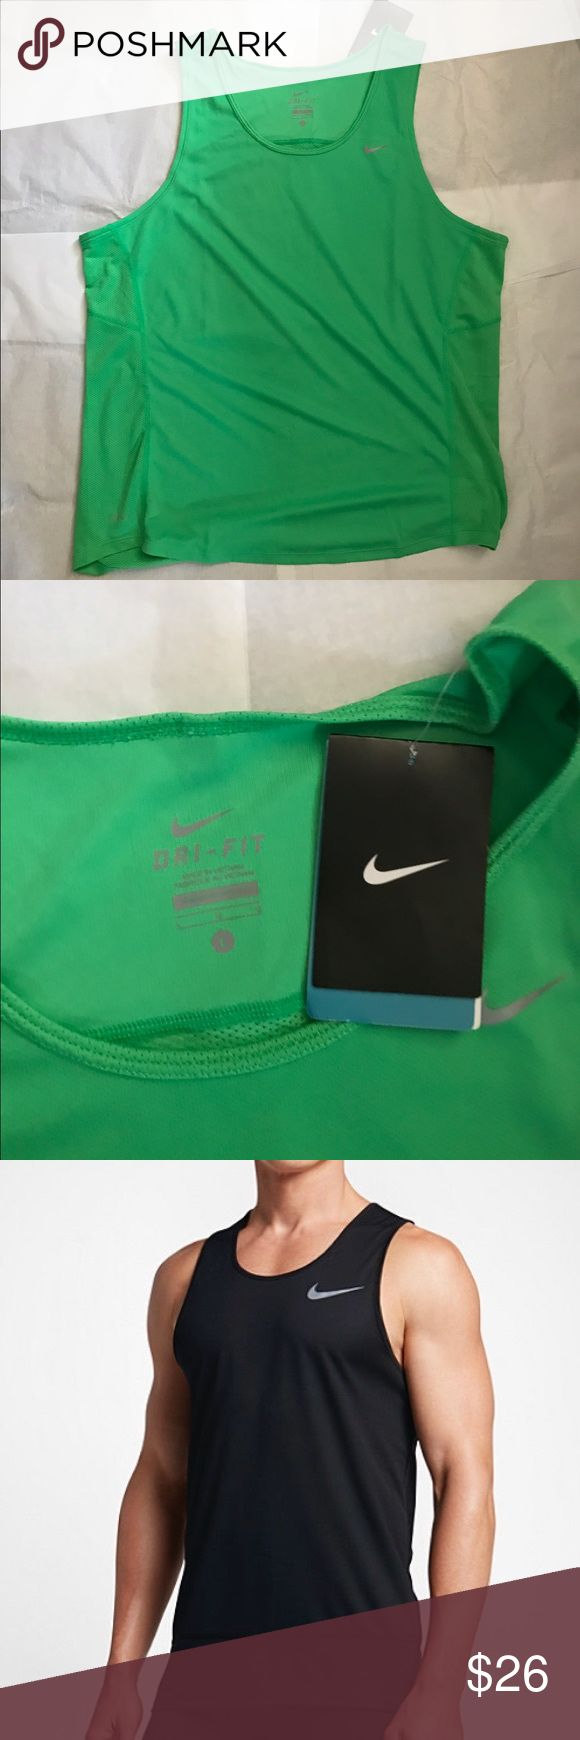 Nike Men's Dri-Fit Green Tank Top Brand new with tags Nike Men's Dri-Fit Green Tank Top. Perfect workout shirt. Never been worn. Nike Shirts Tank Tops